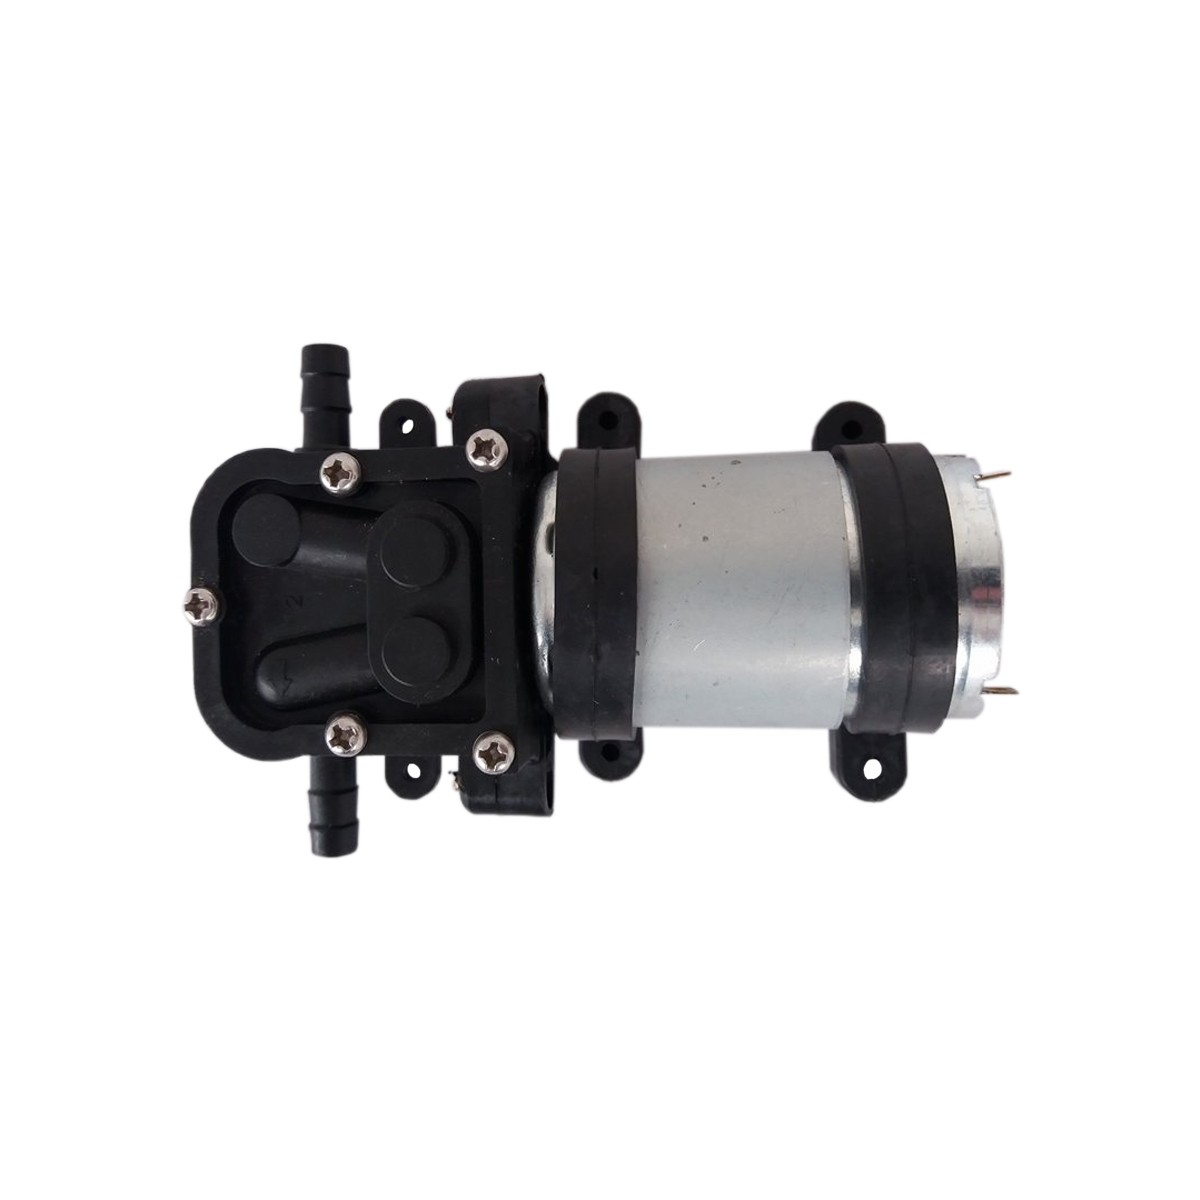 Motor Bomba Diafragma 20 PSI SABD20P